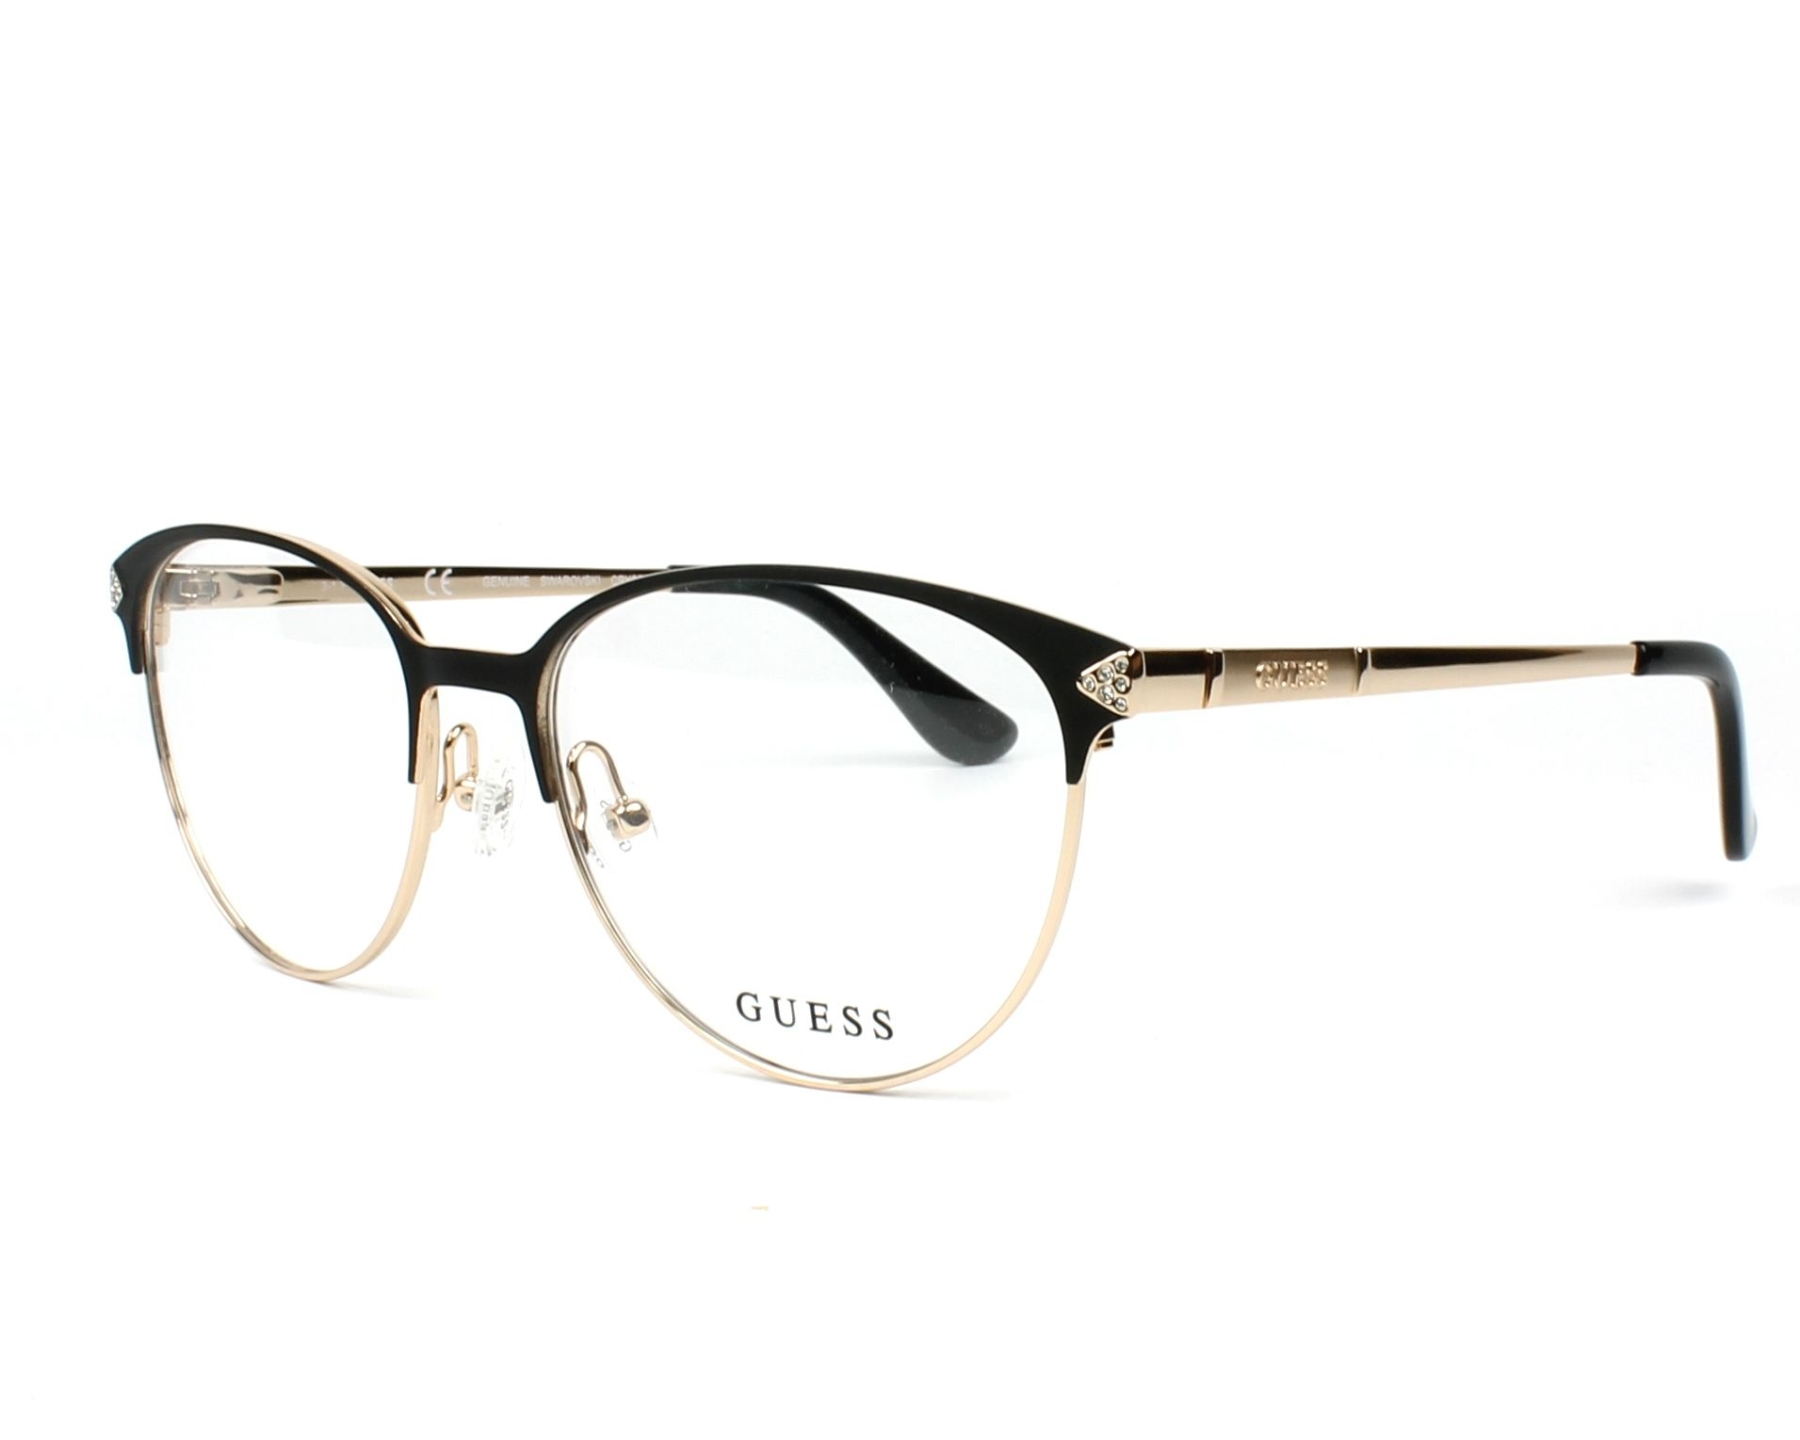 Guess Eyeglasses GU-2633-S 005 Black - Visionet UK